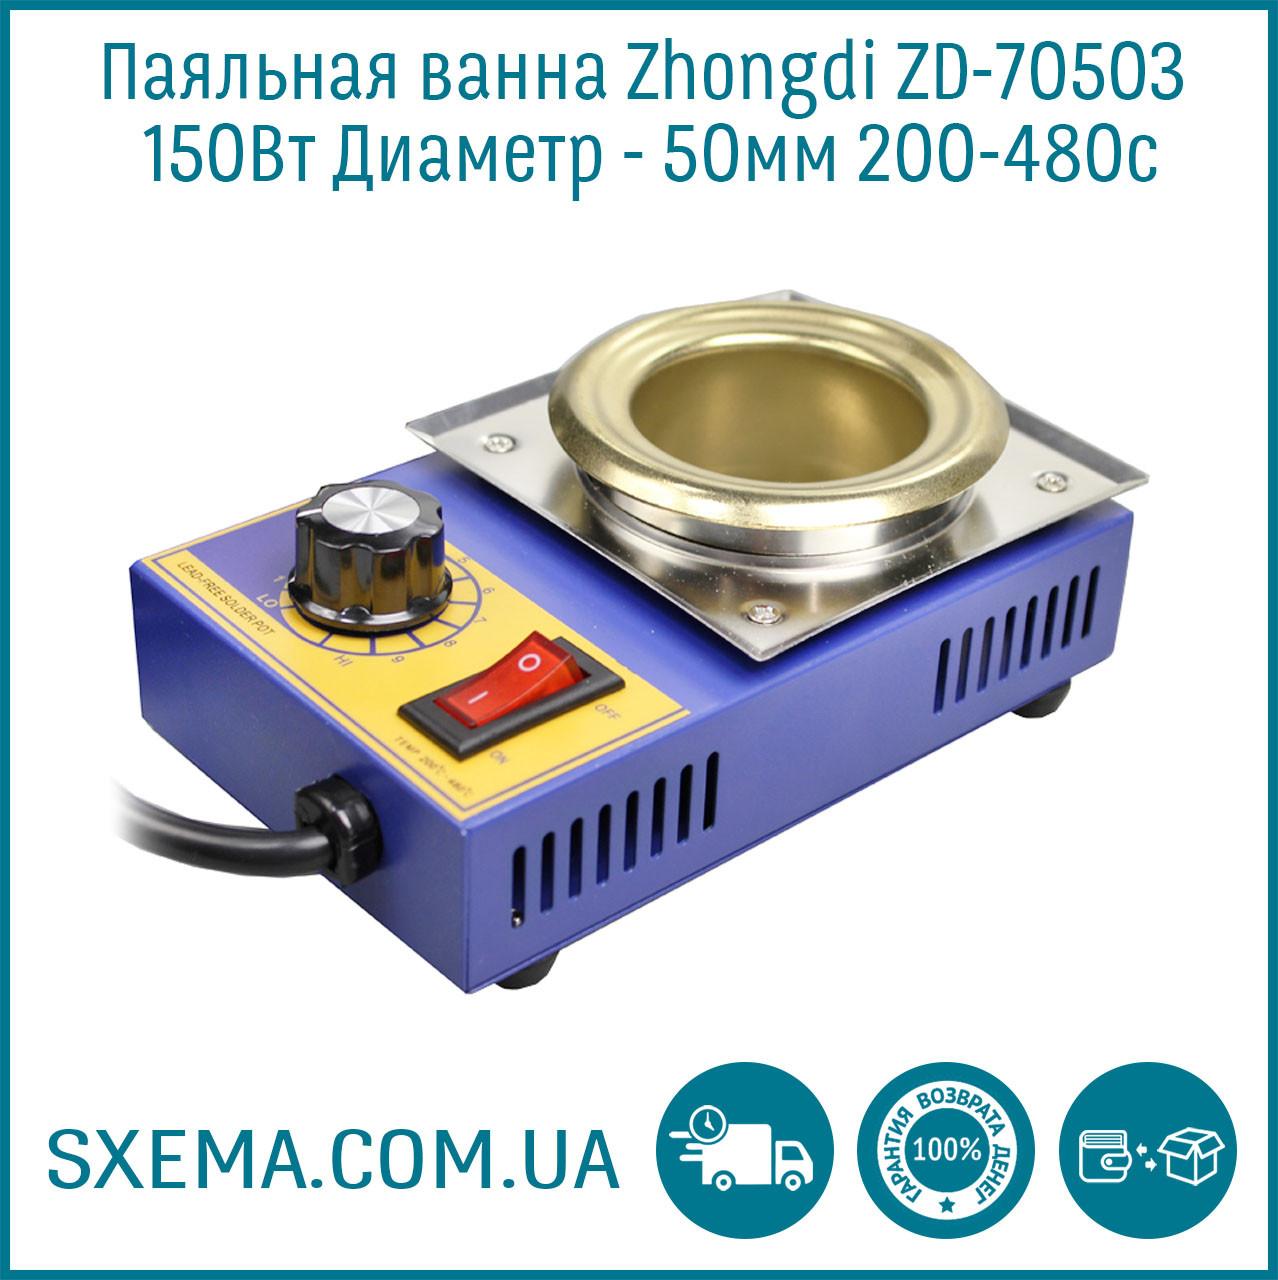 Паяльная ванна Zhongdi DZ-70503 150Вт Диаметр - 50мм 200-480с